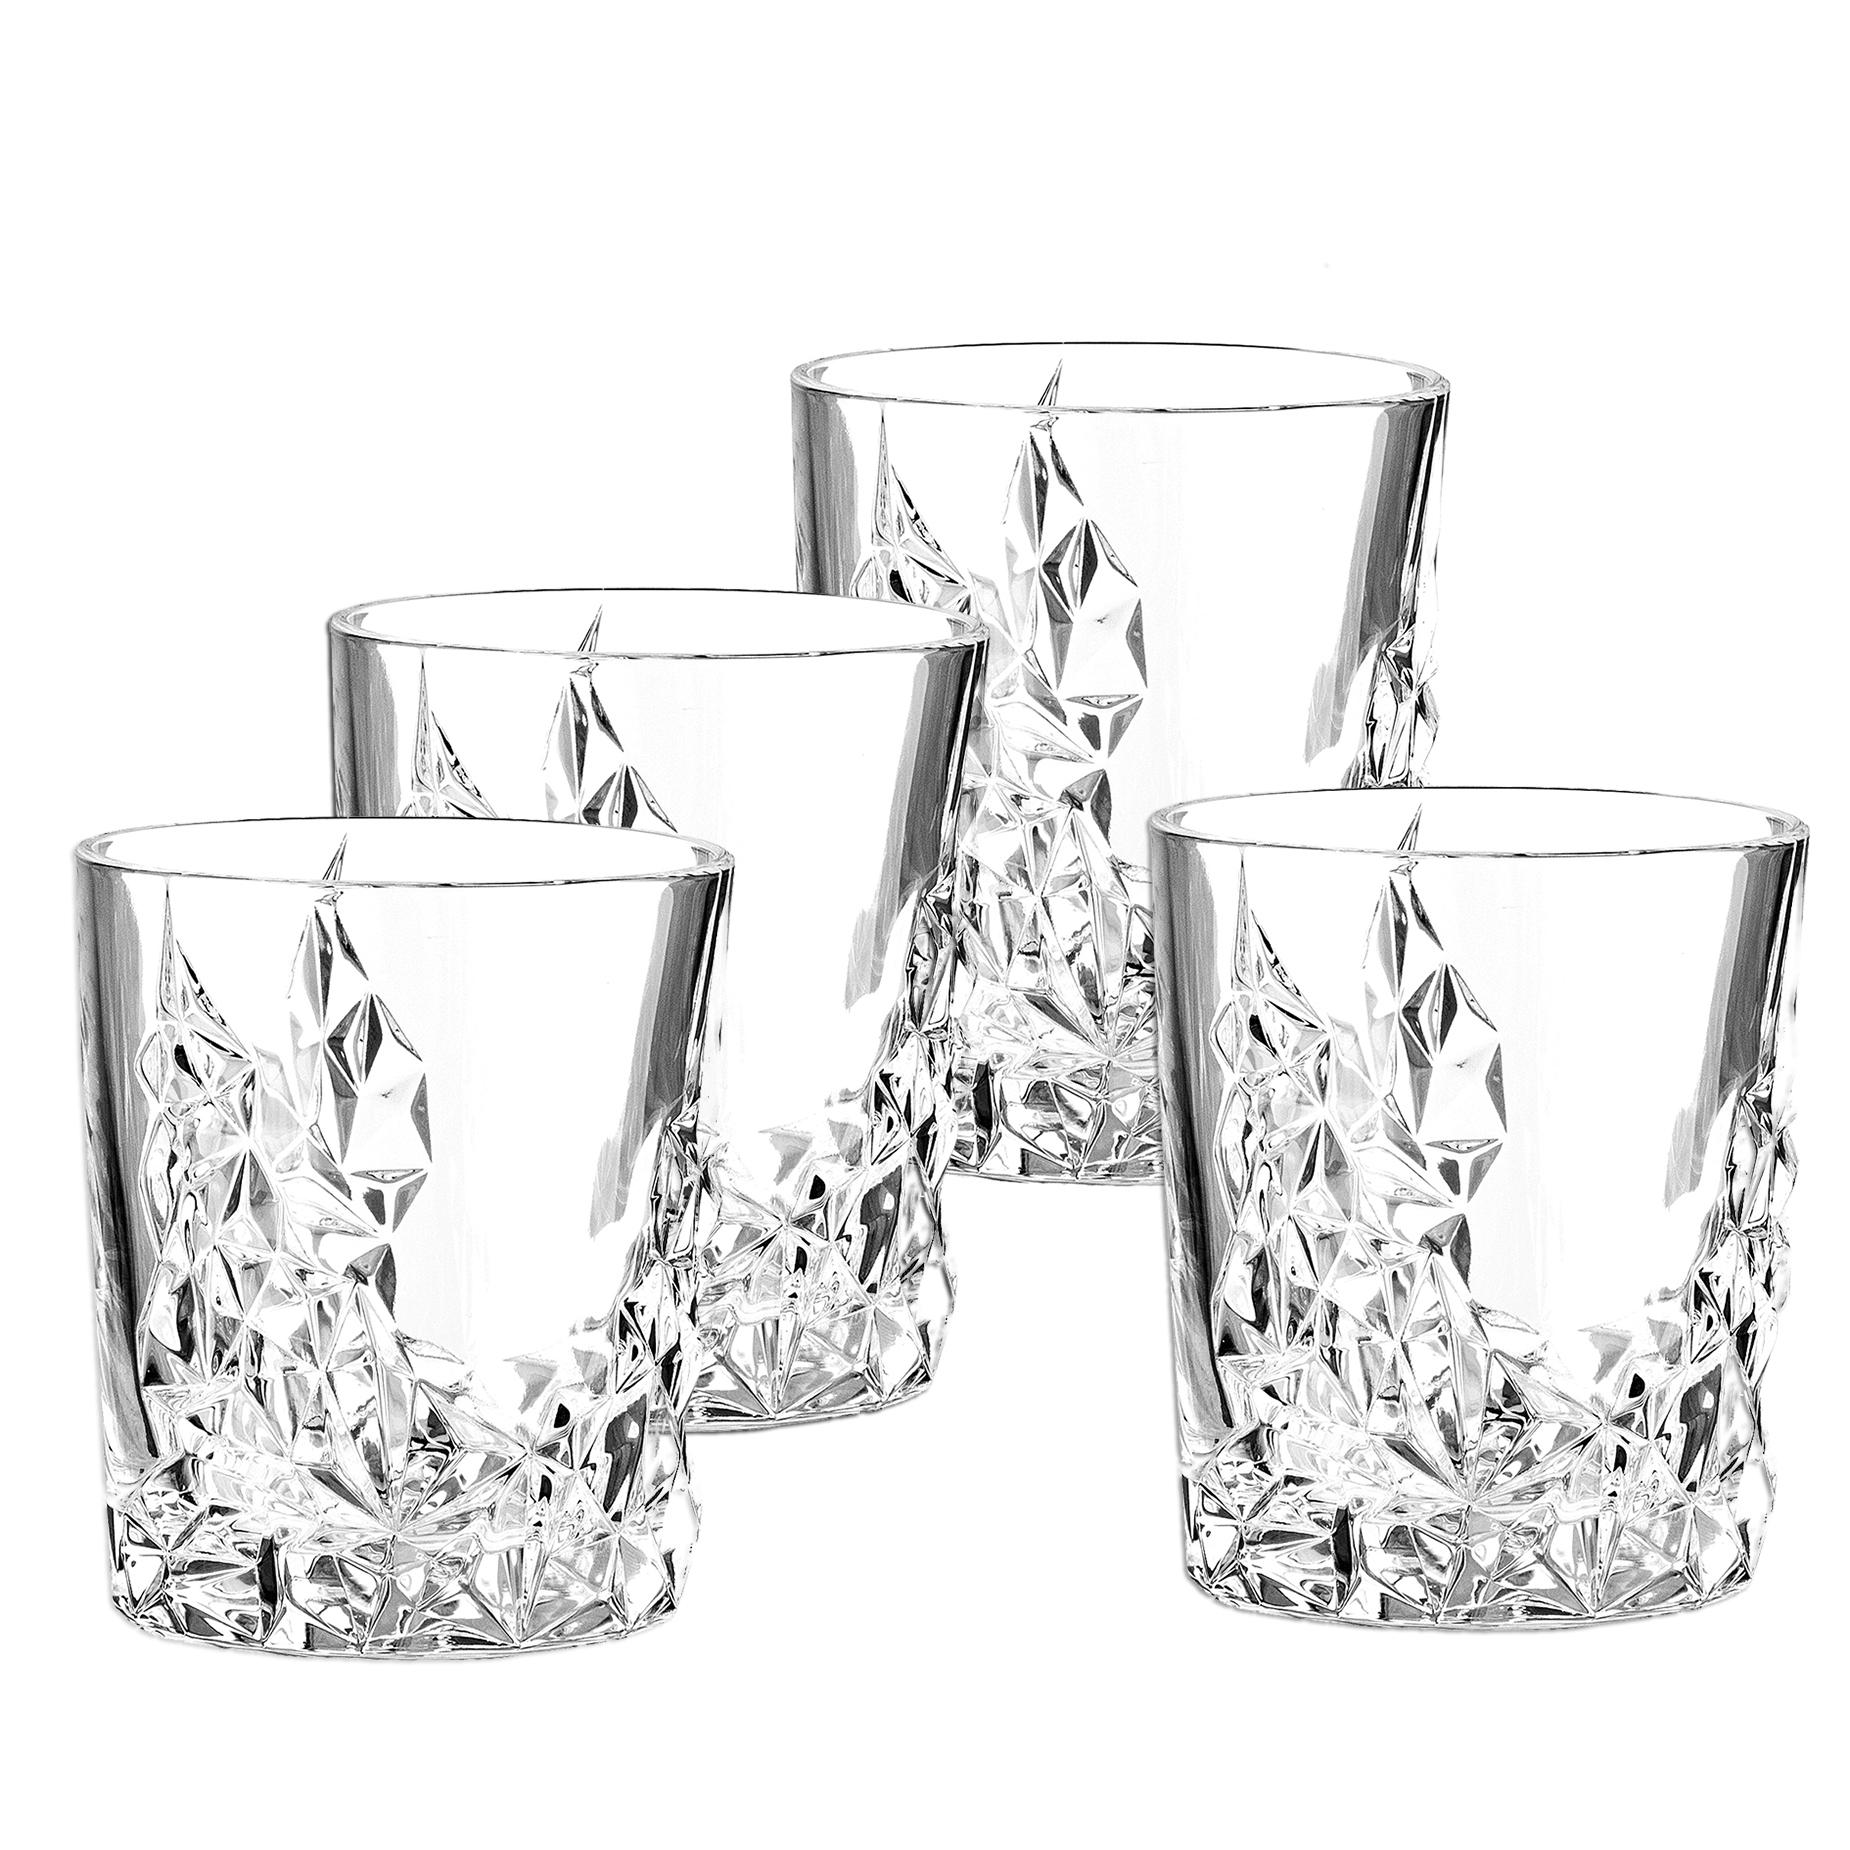 Nachtmann 4 Whiskybecher Sculpture Whiskygläser Tubler Whiskey Glas Gläser Set